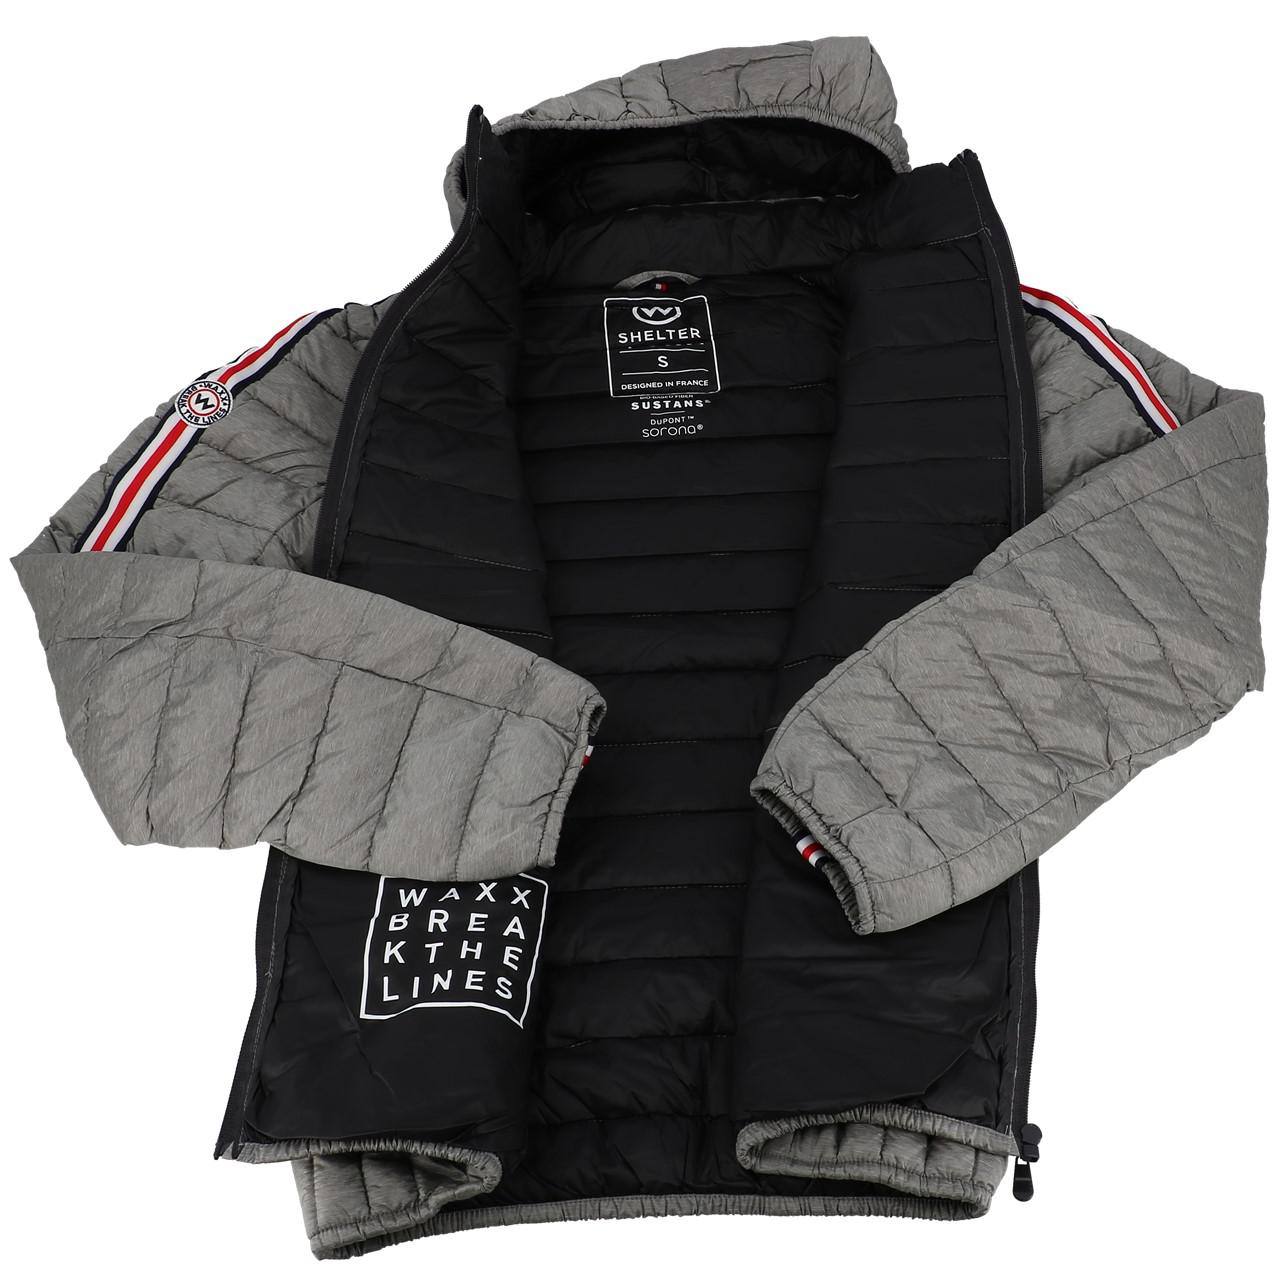 Synthetic-Jackets-Waxx-Shelter-Stripes-Metal-H-Grey-50764-New thumbnail 5